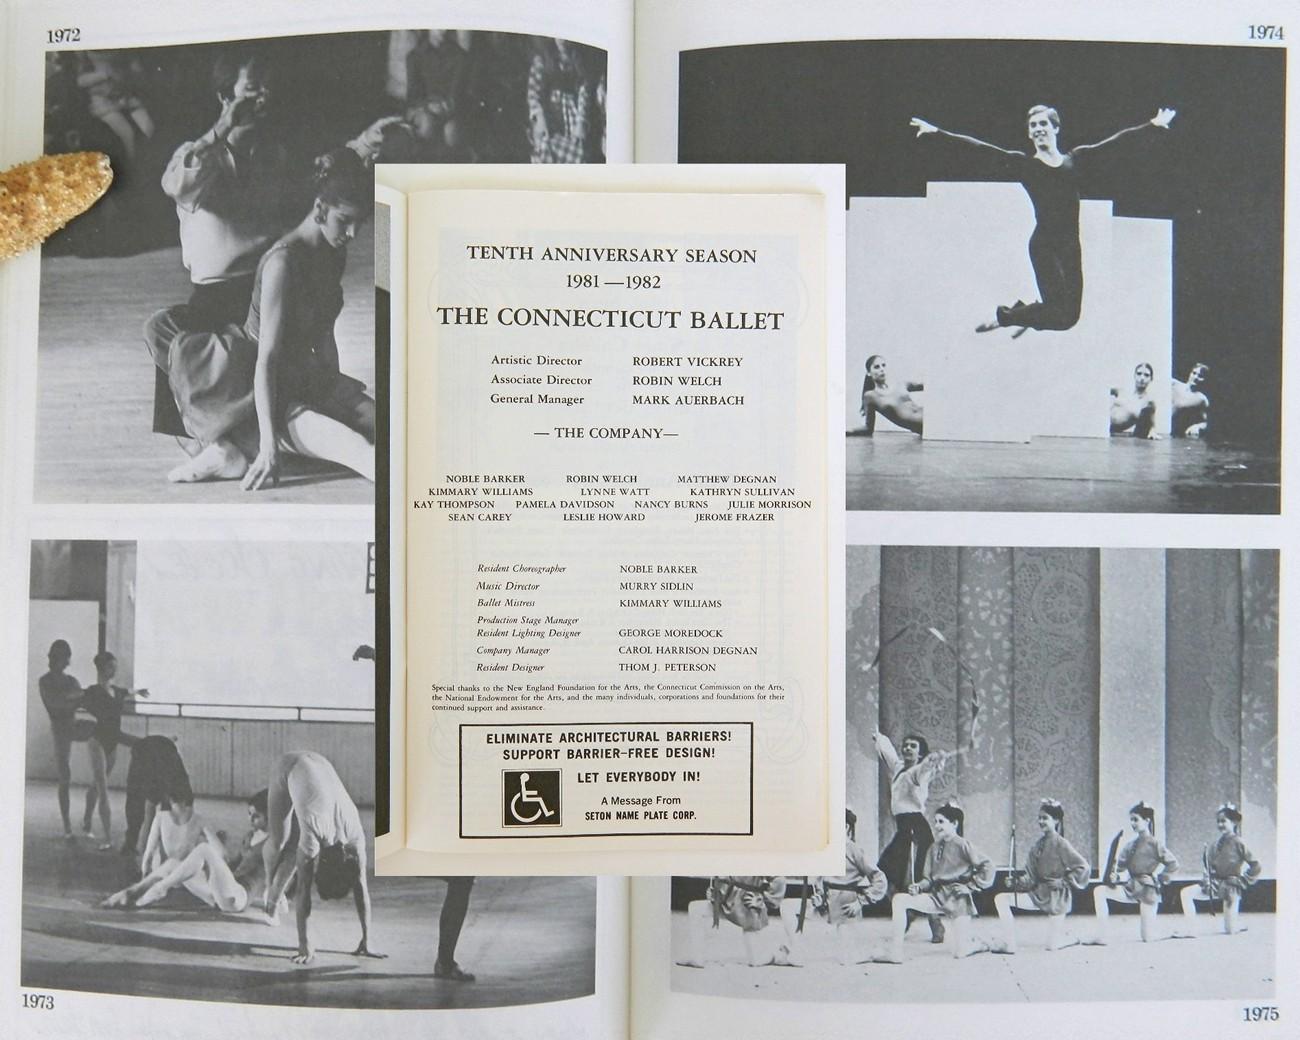 Connecticut Ballet Tenth Anniversary Season Program 1982